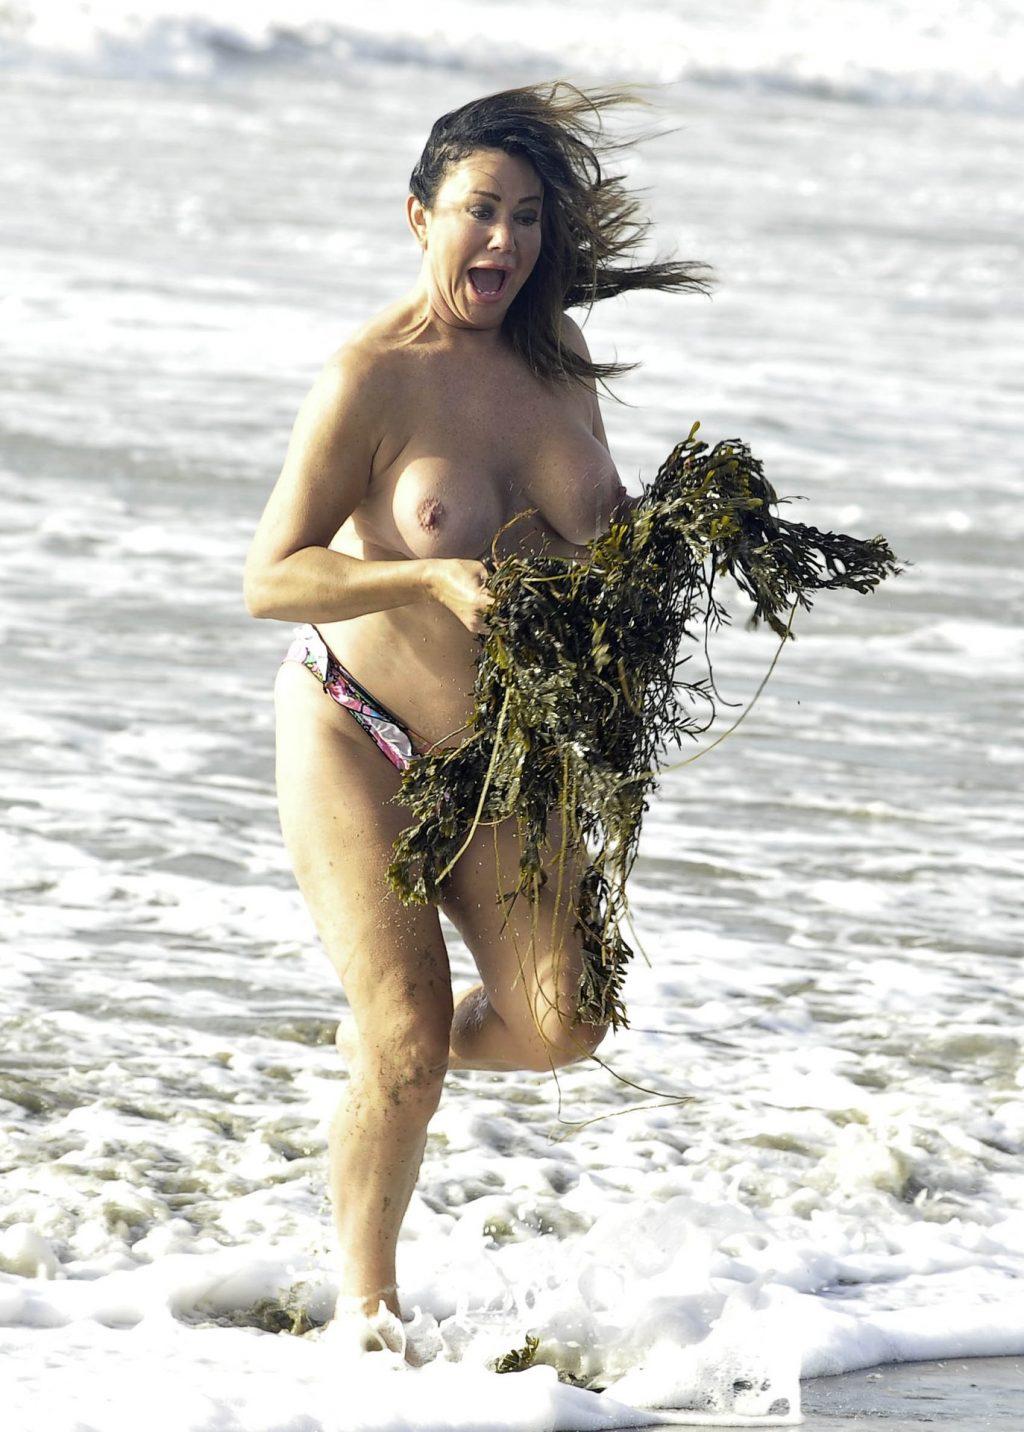 Lisa Appleton Topless (15 Photos)